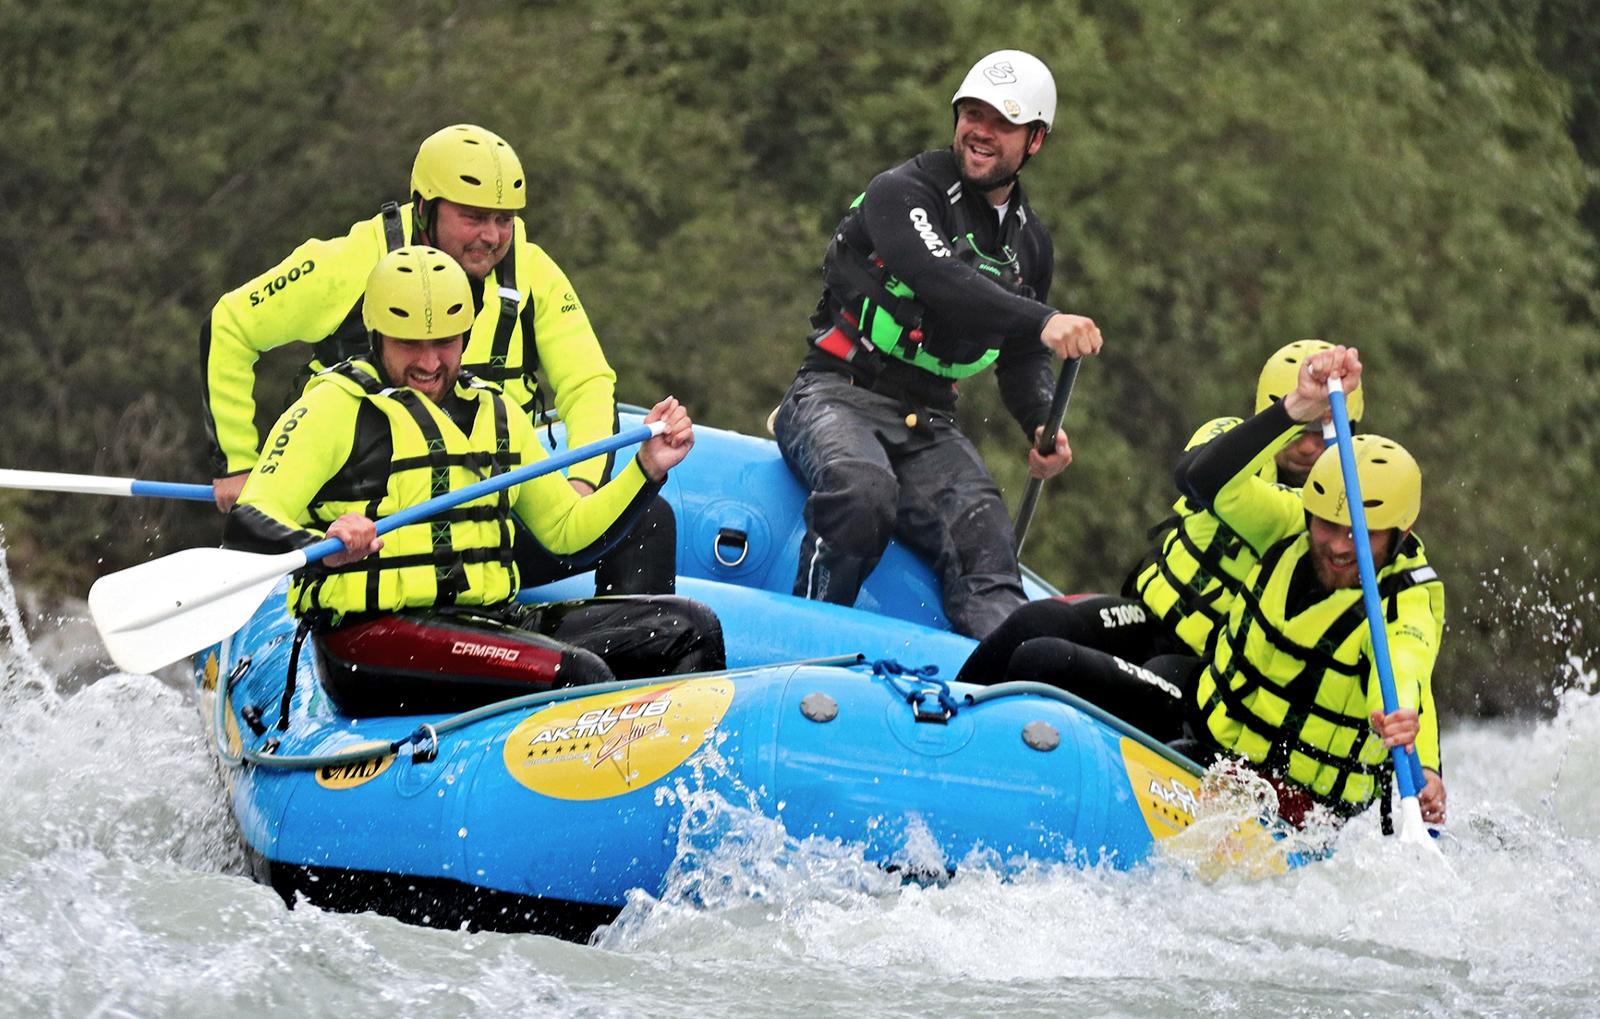 aktivurlaub-inkl-e-bike-und-rafting-2-uen-2-personen-bg2